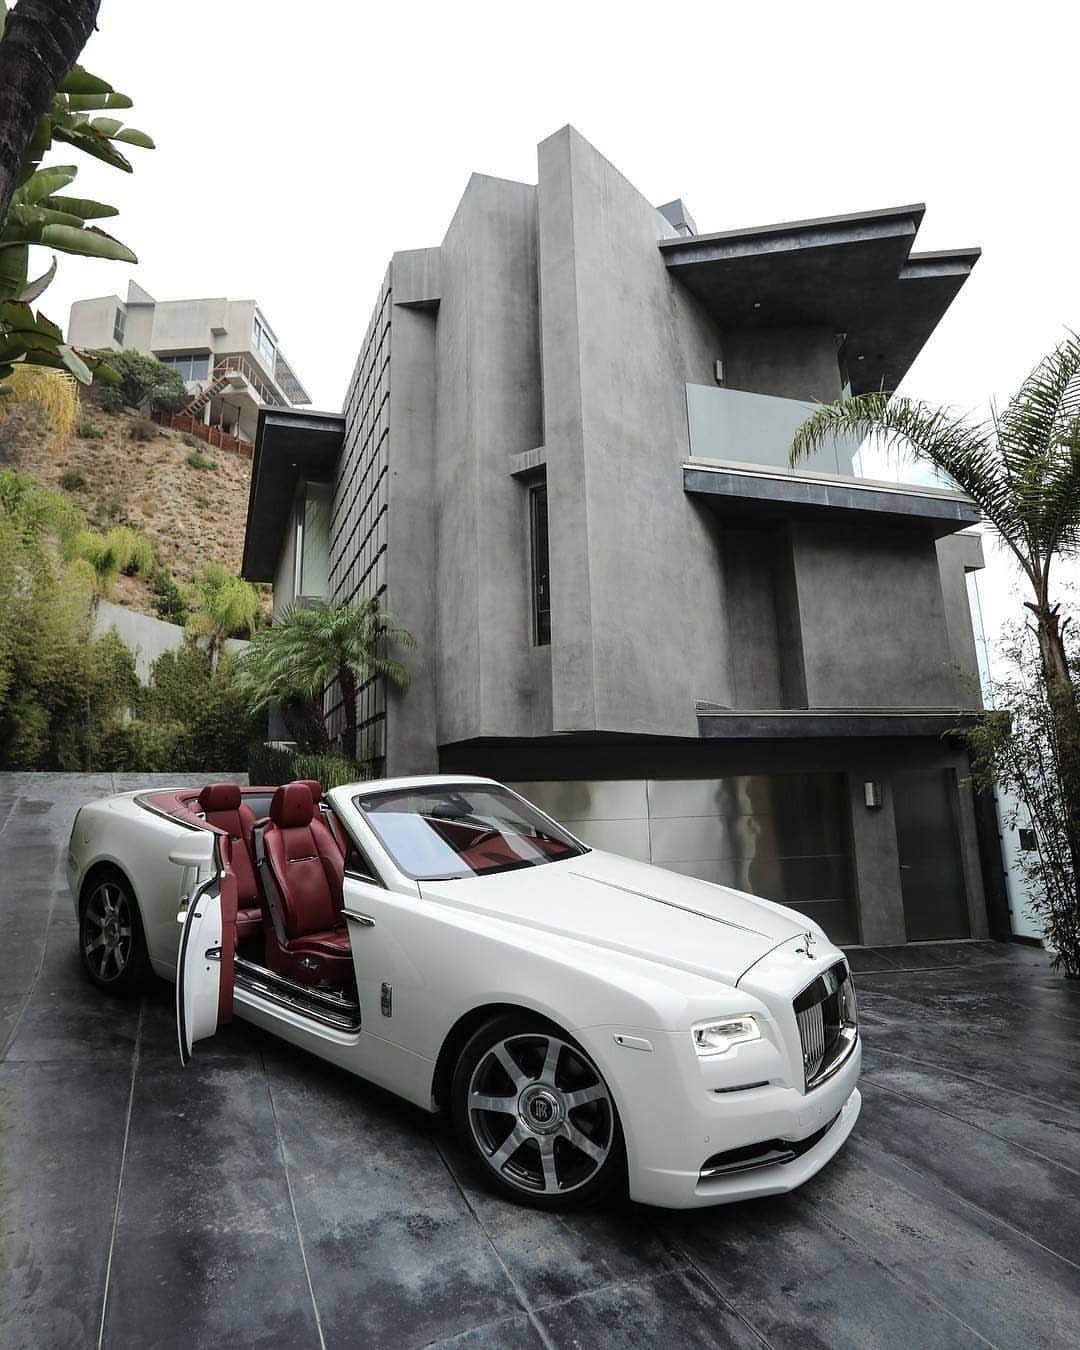 Rolls Royce Dawn Luxury Homes Interior Modern House Design Luxury Cars